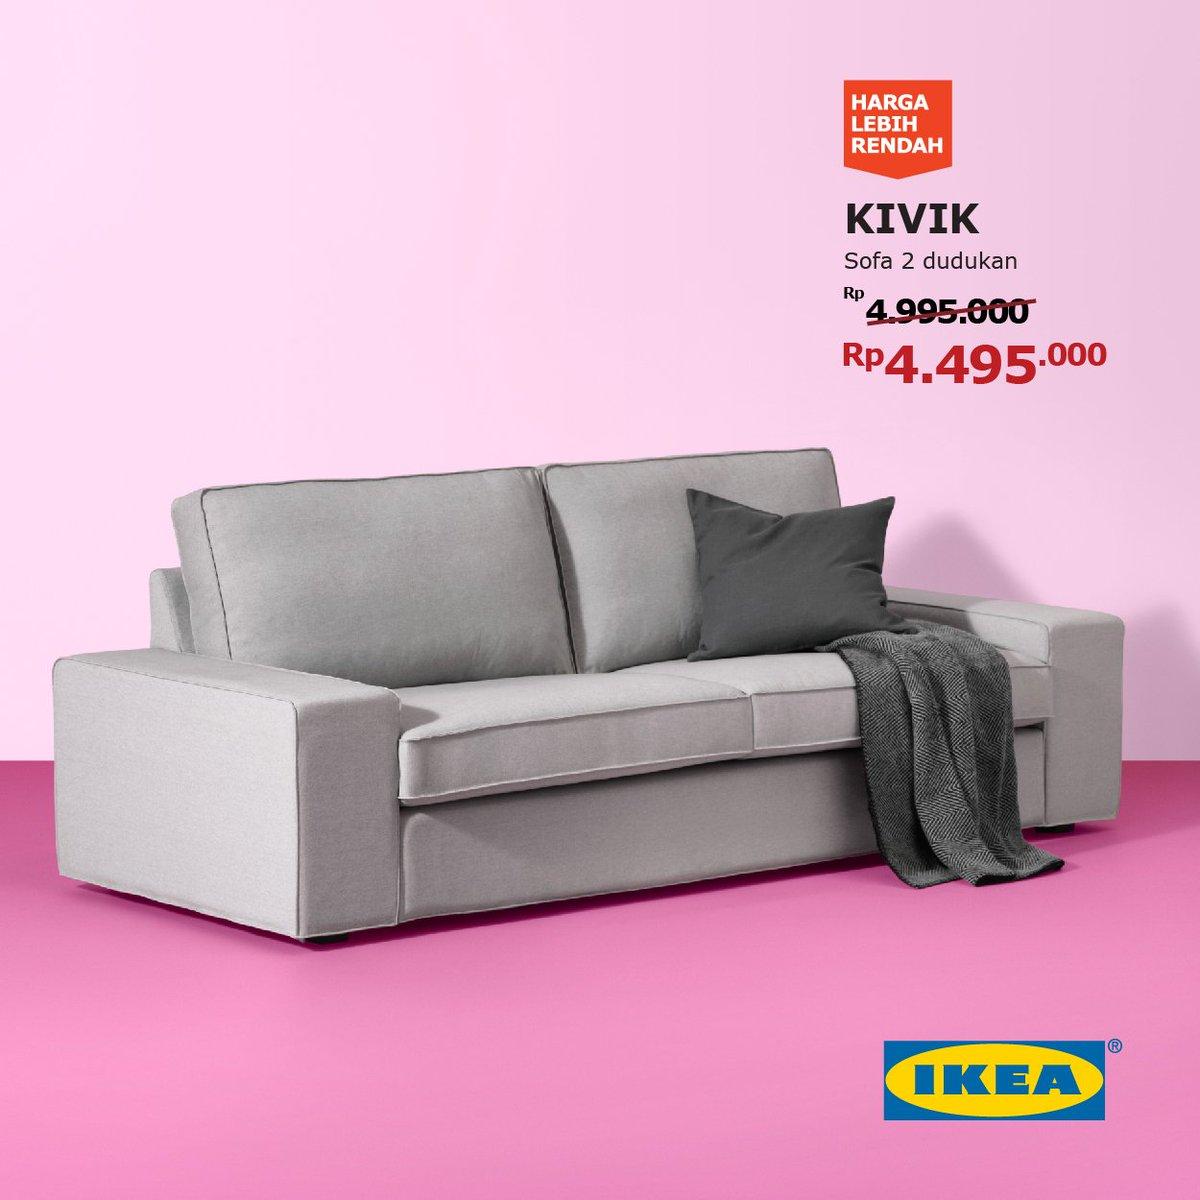 Ikea Indonesia On Twitter Harga Lebih Rendah Sudah Punya